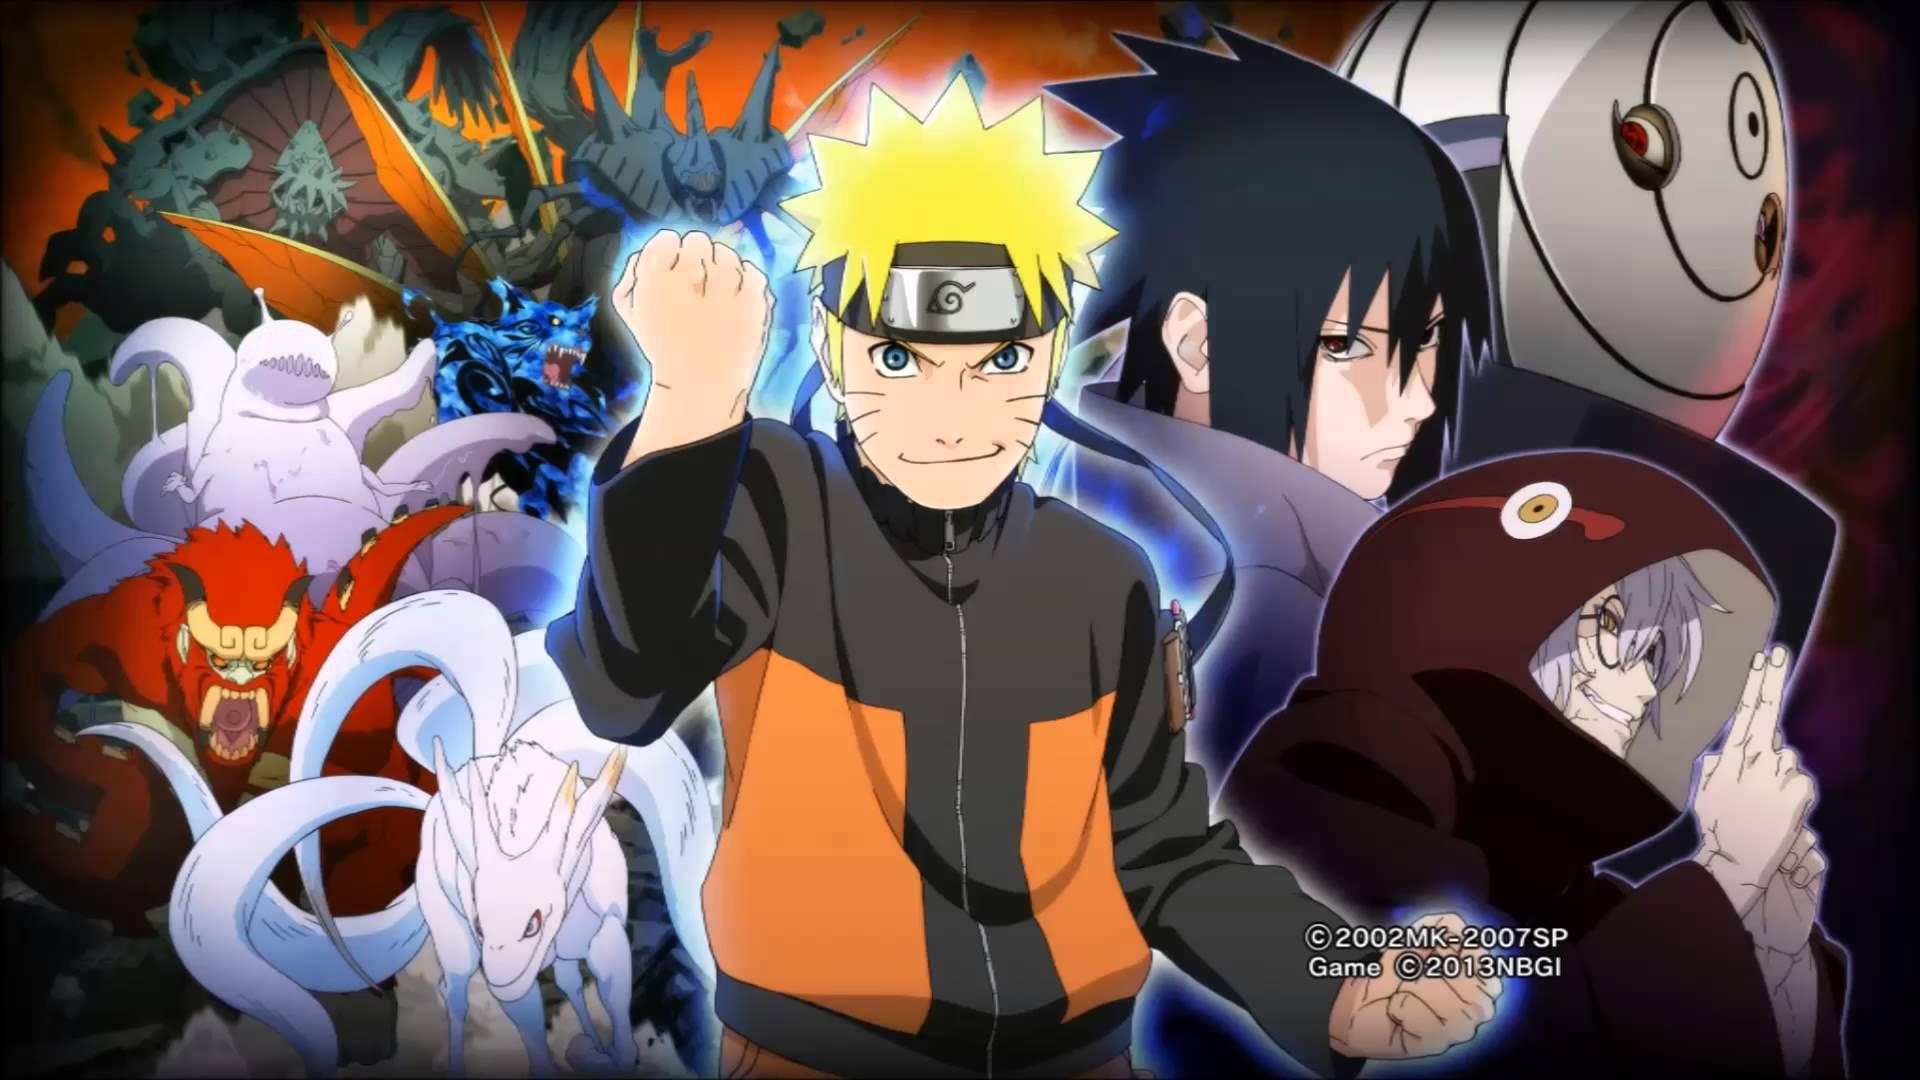 Top Wallpaper Naruto Original - Naruto-Shippuden-Wallpaper-Hd-012  Trends_986920.jpg